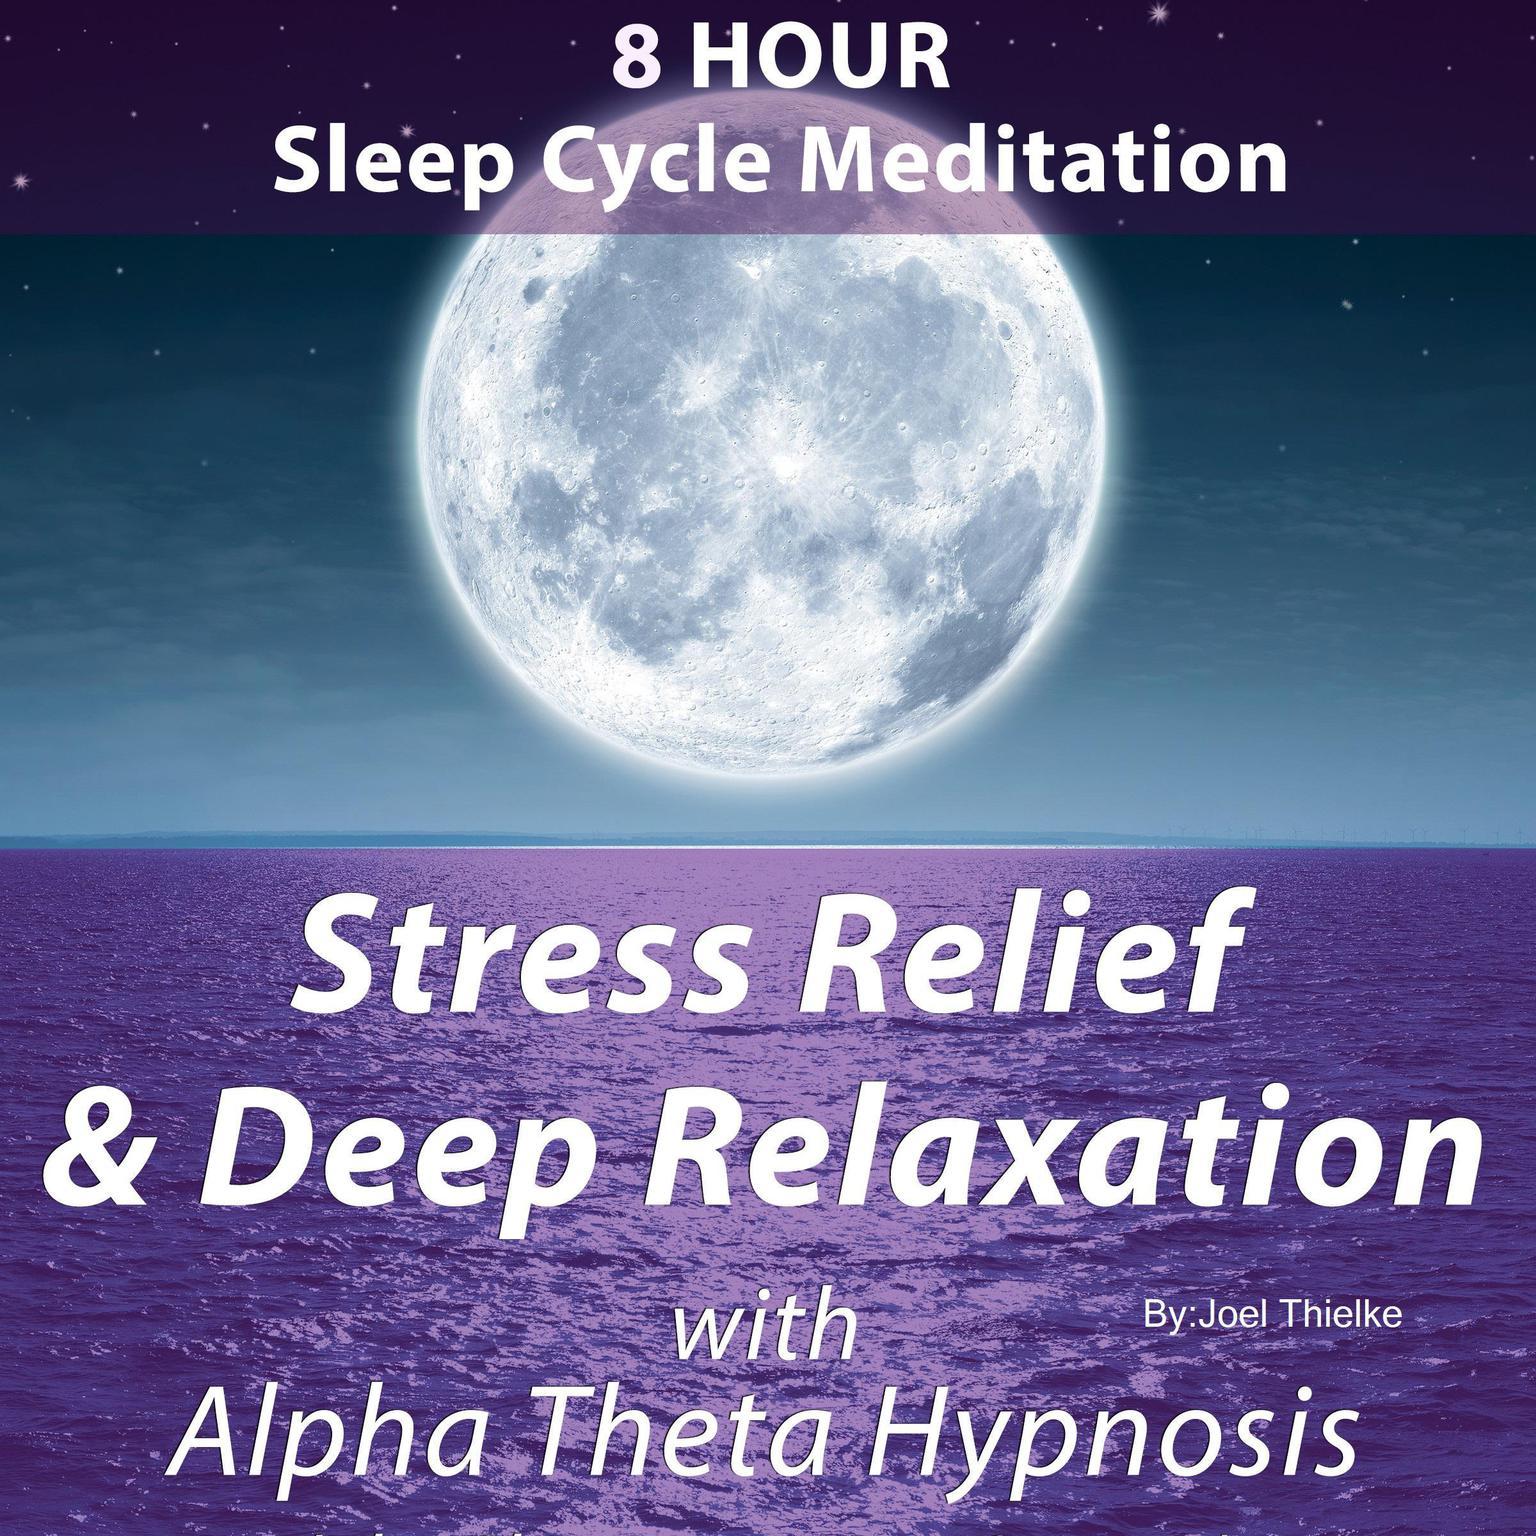 8 Hour Sleep Cycle Meditation - Stress Relief & Deep Relaxation with Alpha Theta Hypnosis Audiobook, by Joel Thielke